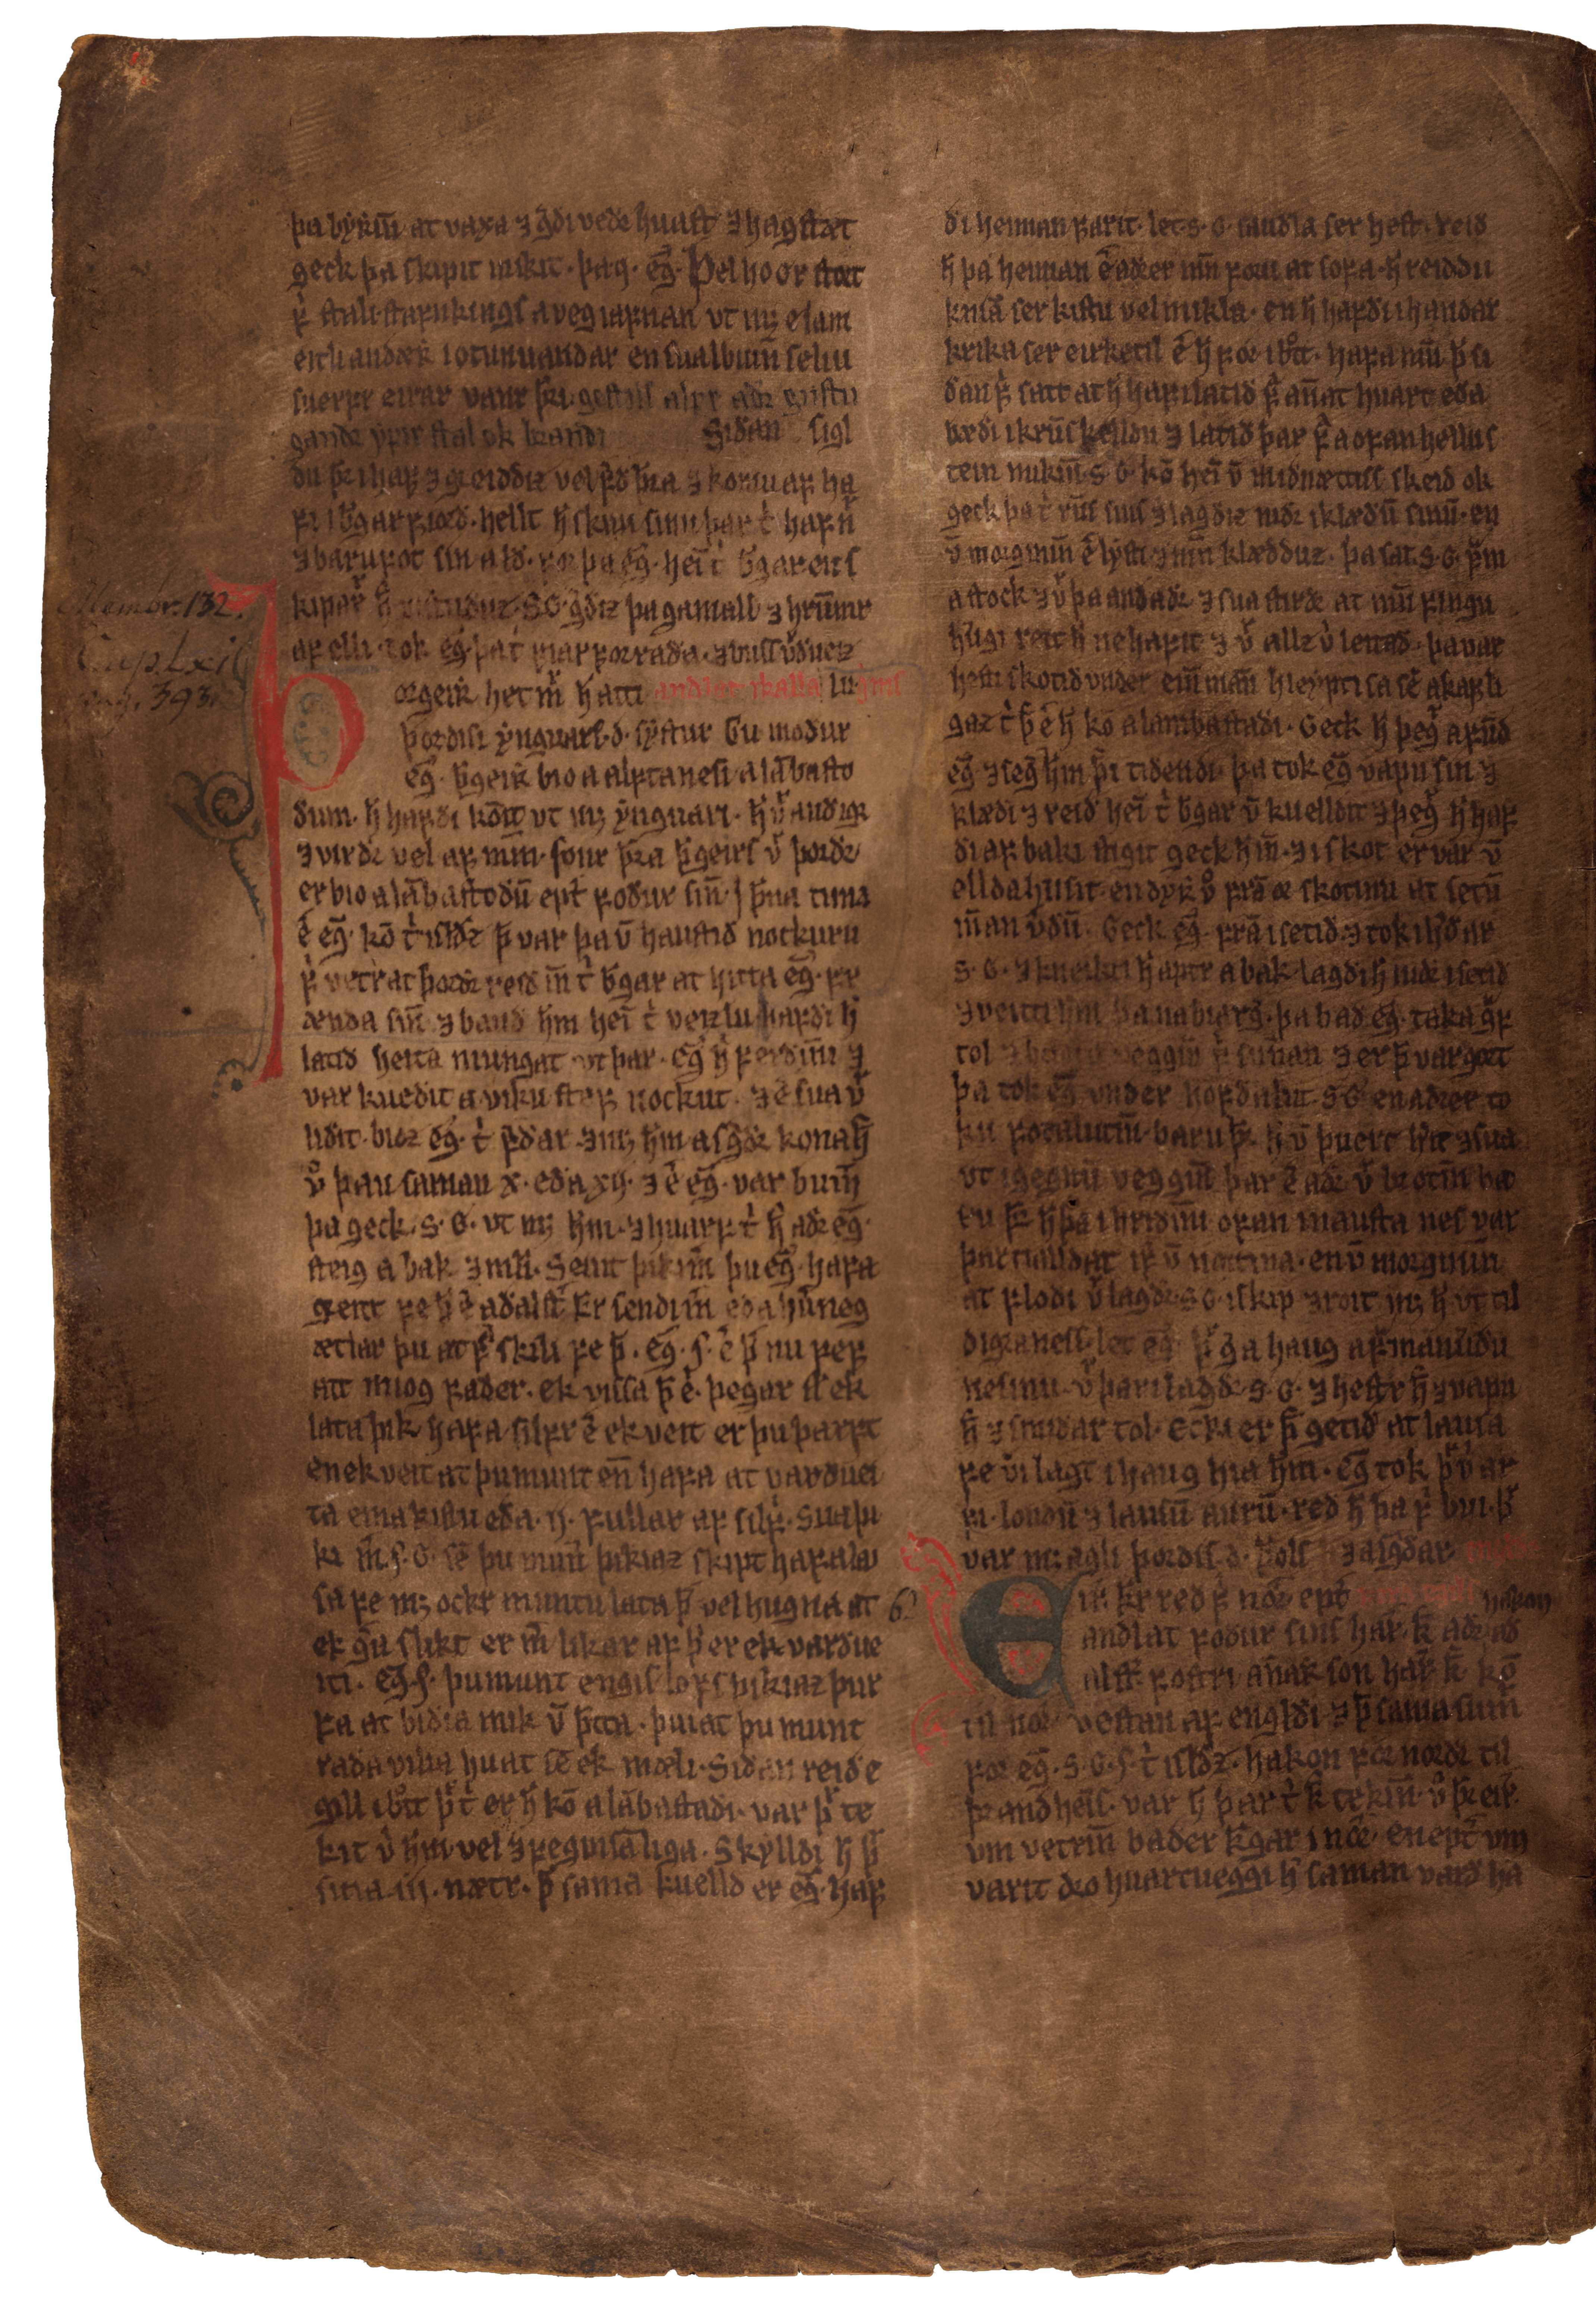 AM 132 fol - 85v